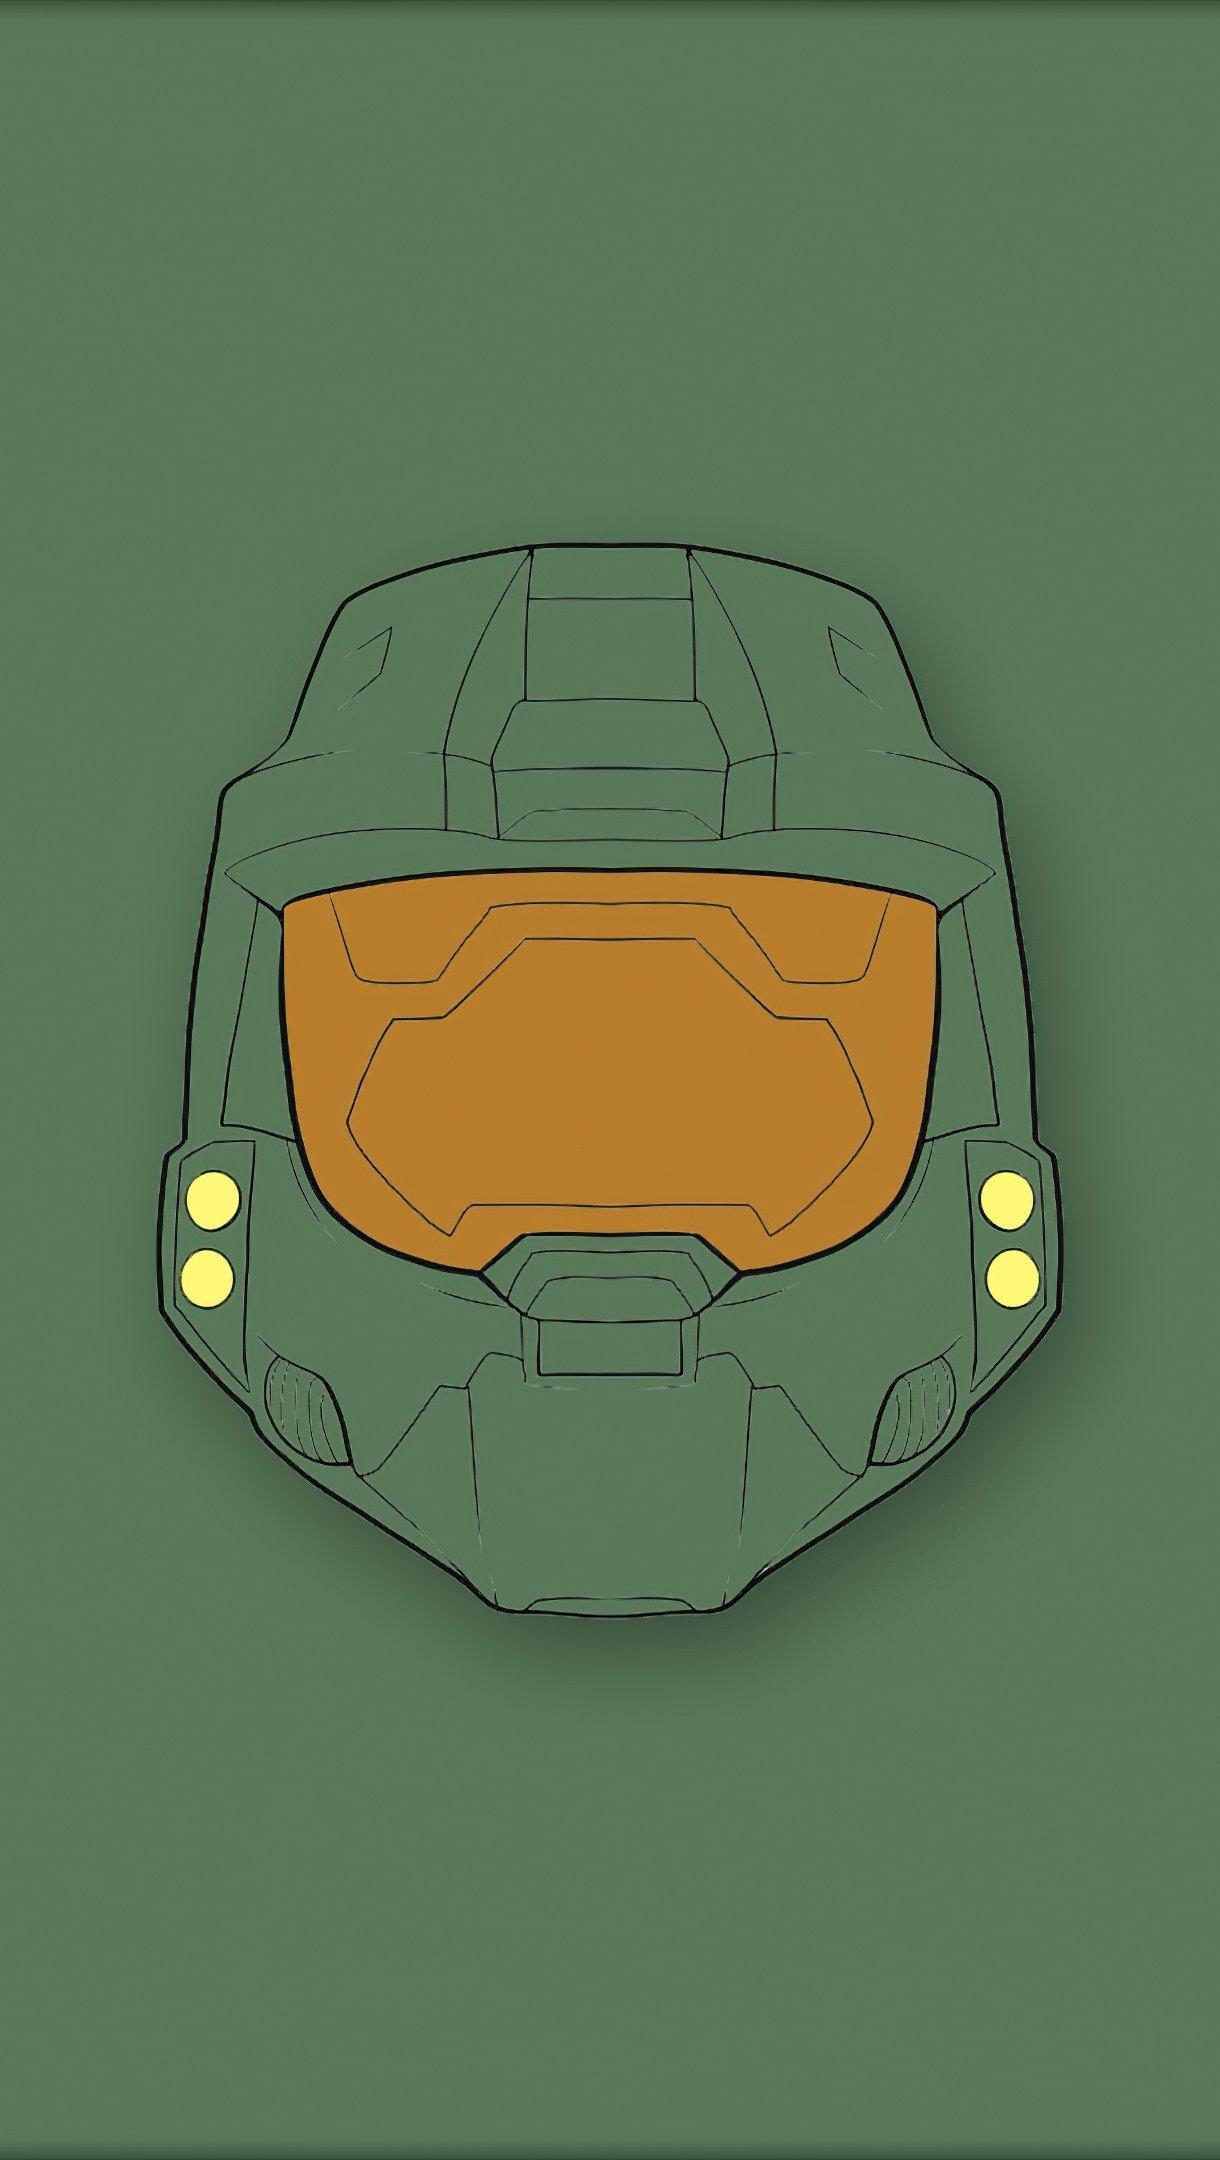 Wallpaper Halo Master Chief Minimalist Vertical